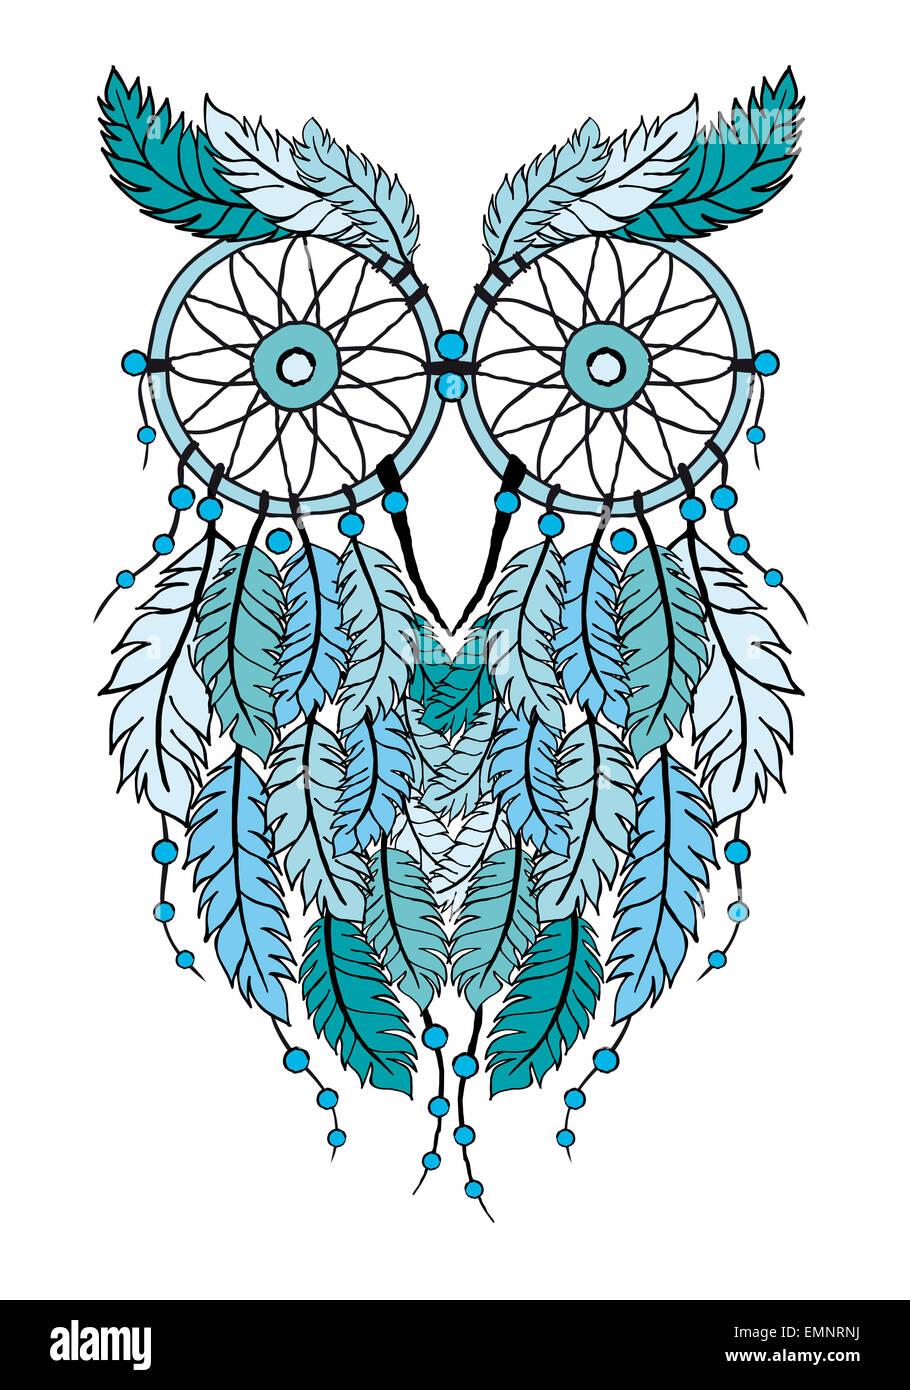 Owl dreamcatcher drawing - photo#12